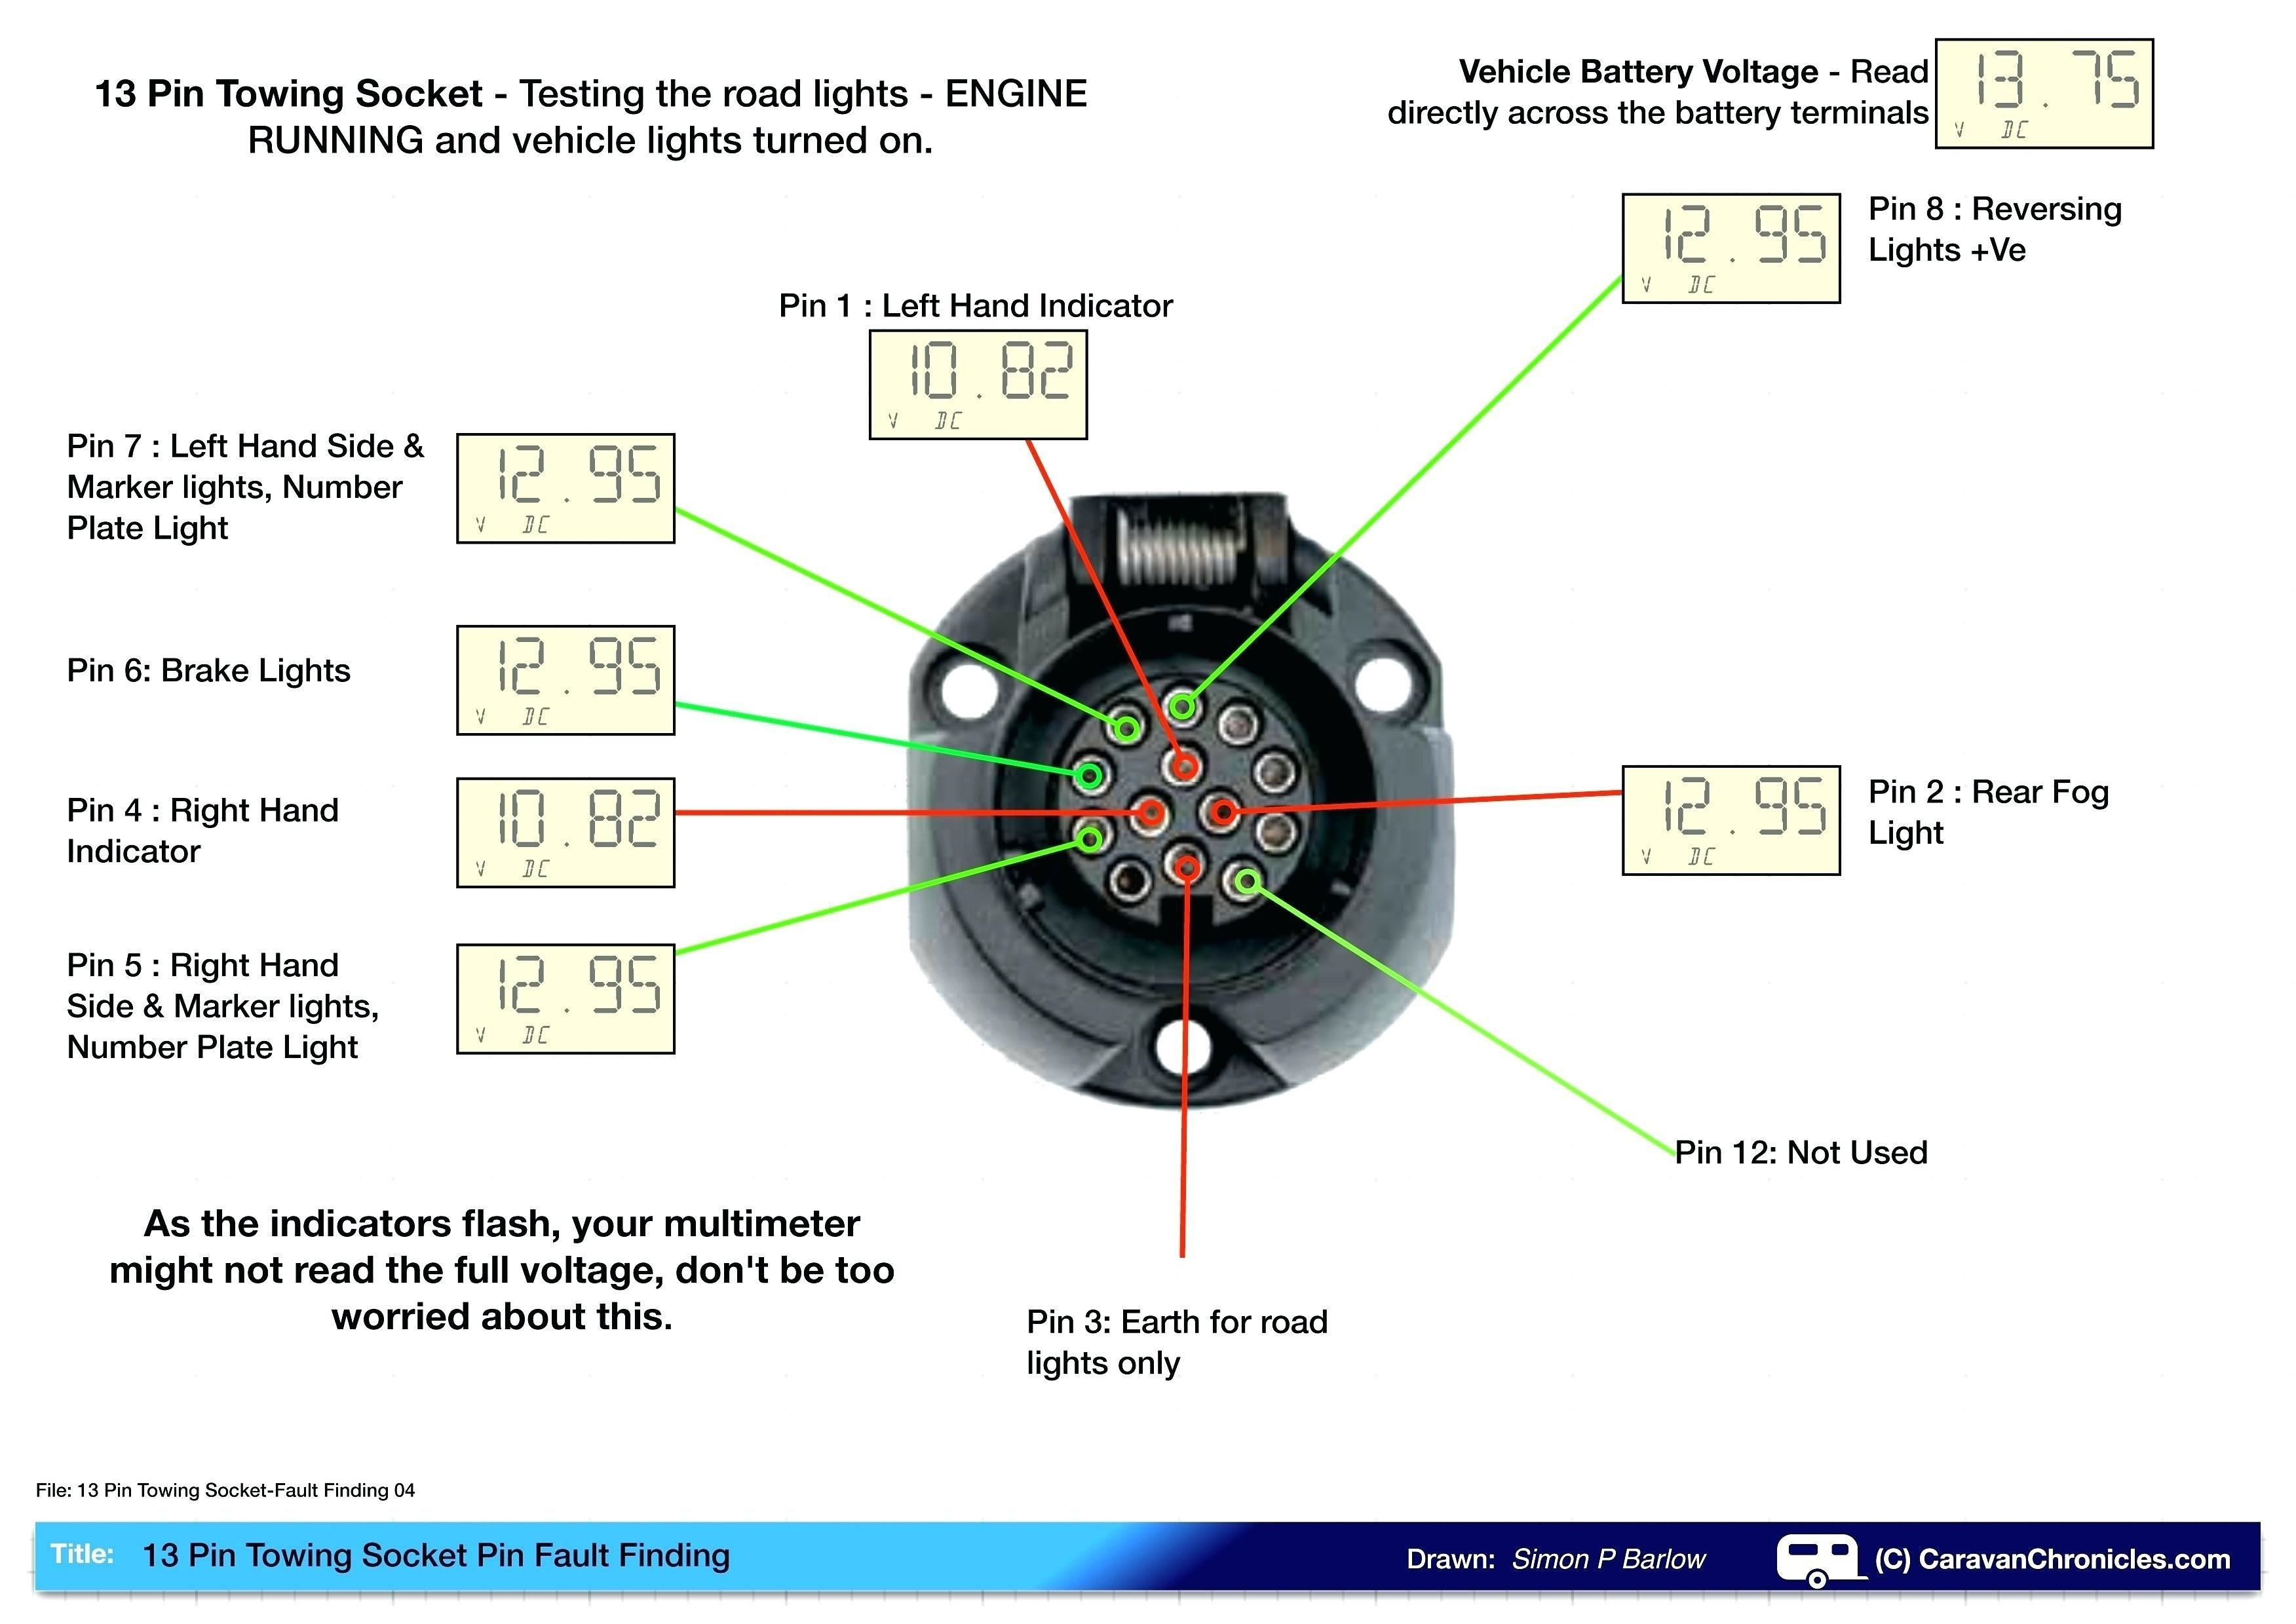 7 Wire Trailer Plug Diagram Wiring Diagram for Rv Plug Save 7 Wire Trailer Plug Diagram New Best Of 7 Wire Trailer Plug Diagram